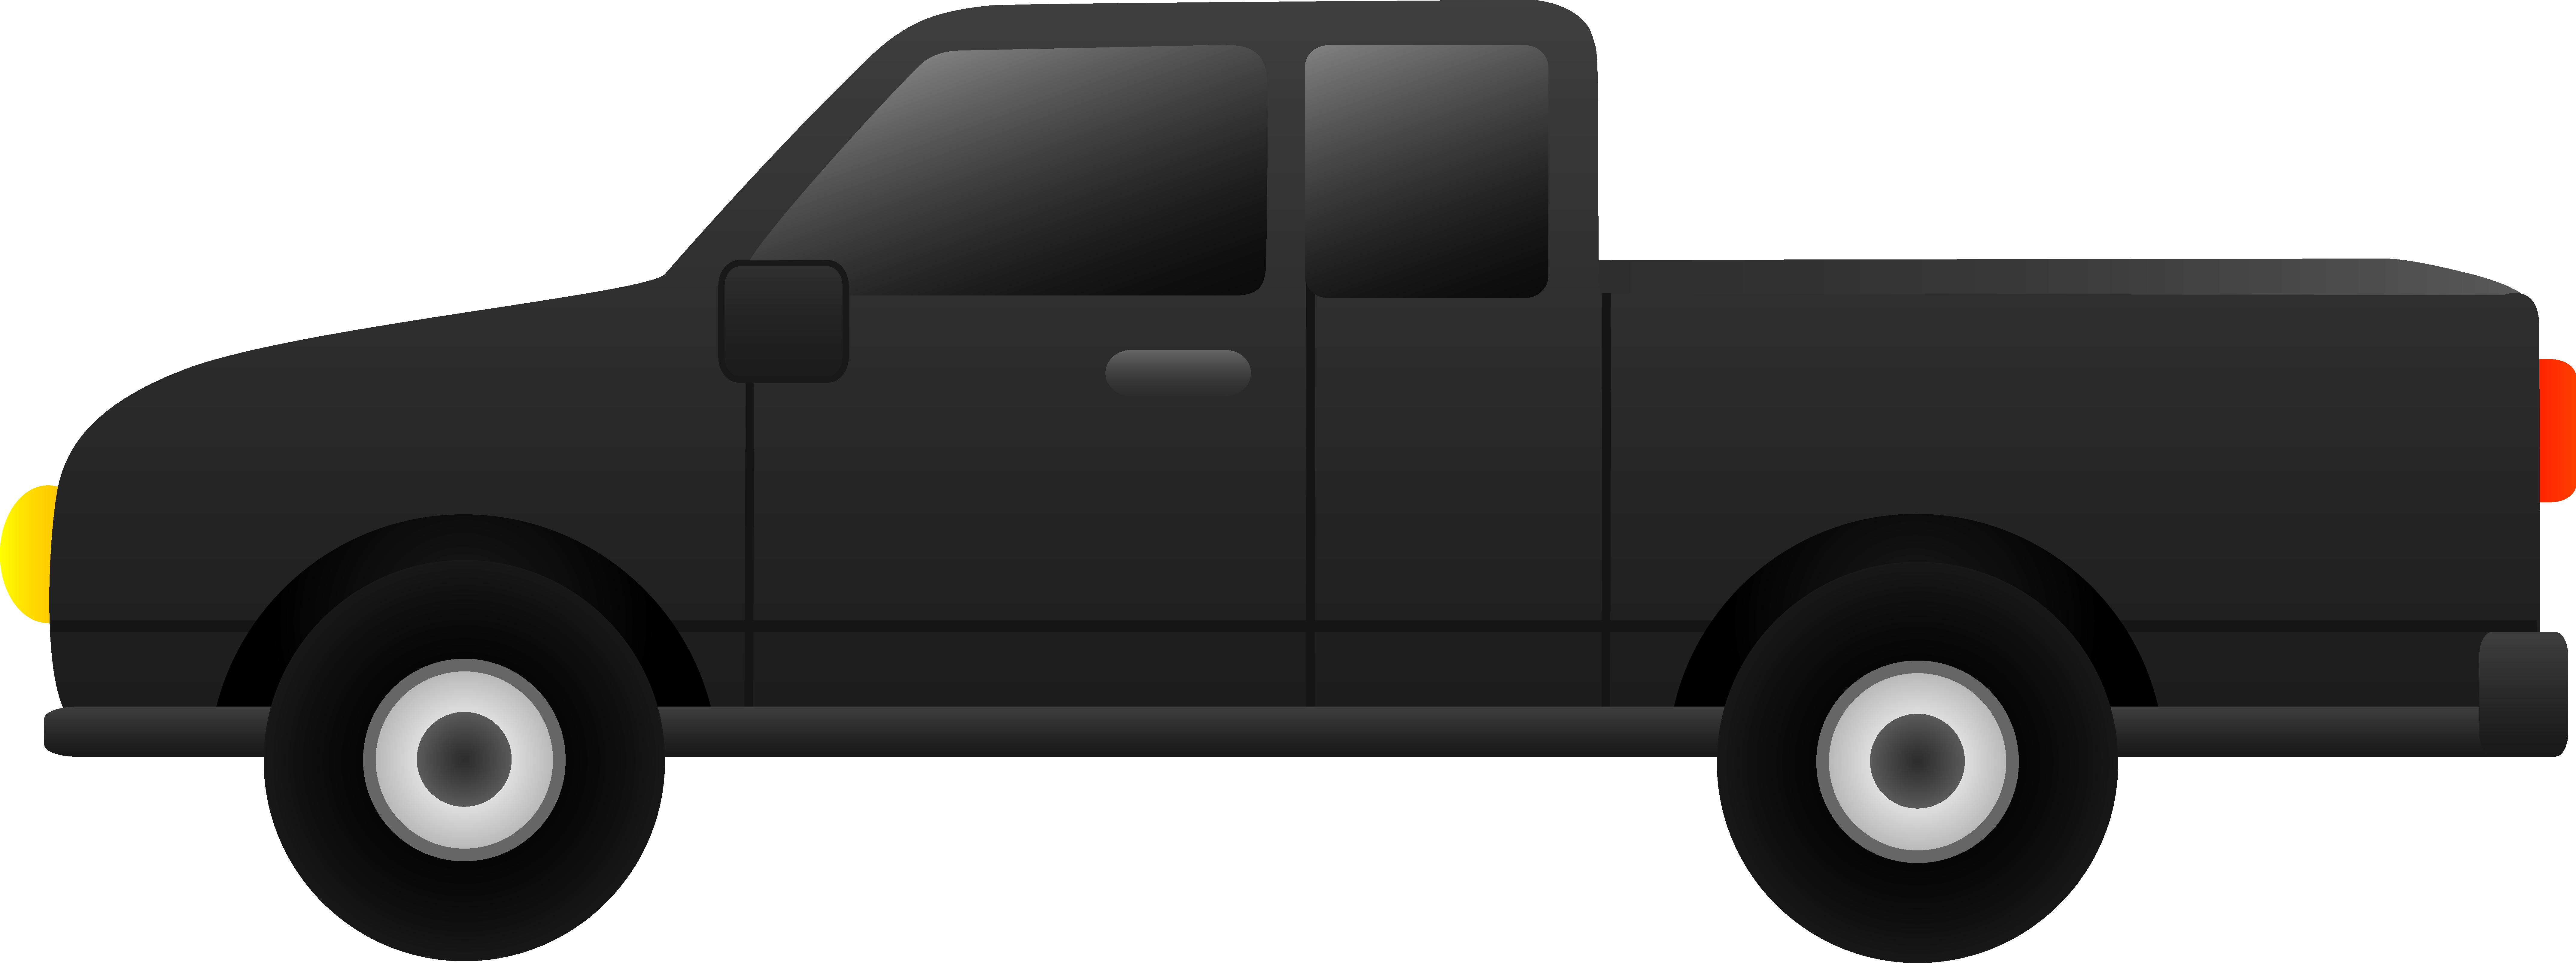 Pickup truck Toyota Hilux Toyota Tacoma Car Van.